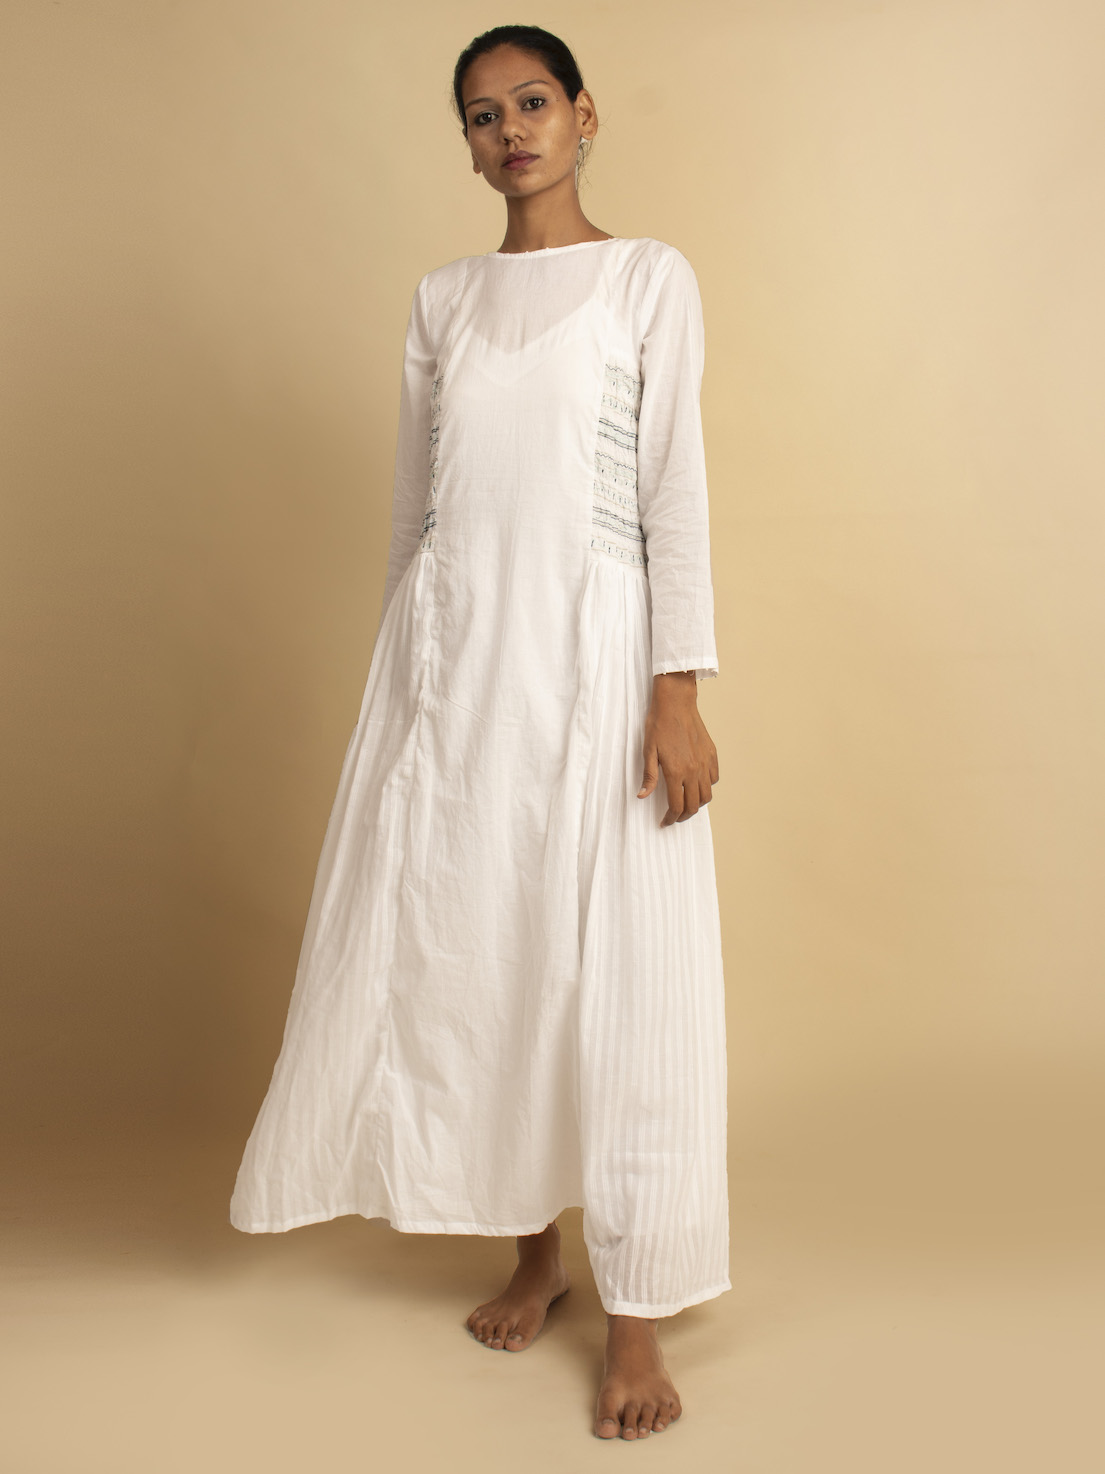 OurDve | DIBA DRESS - WHITE